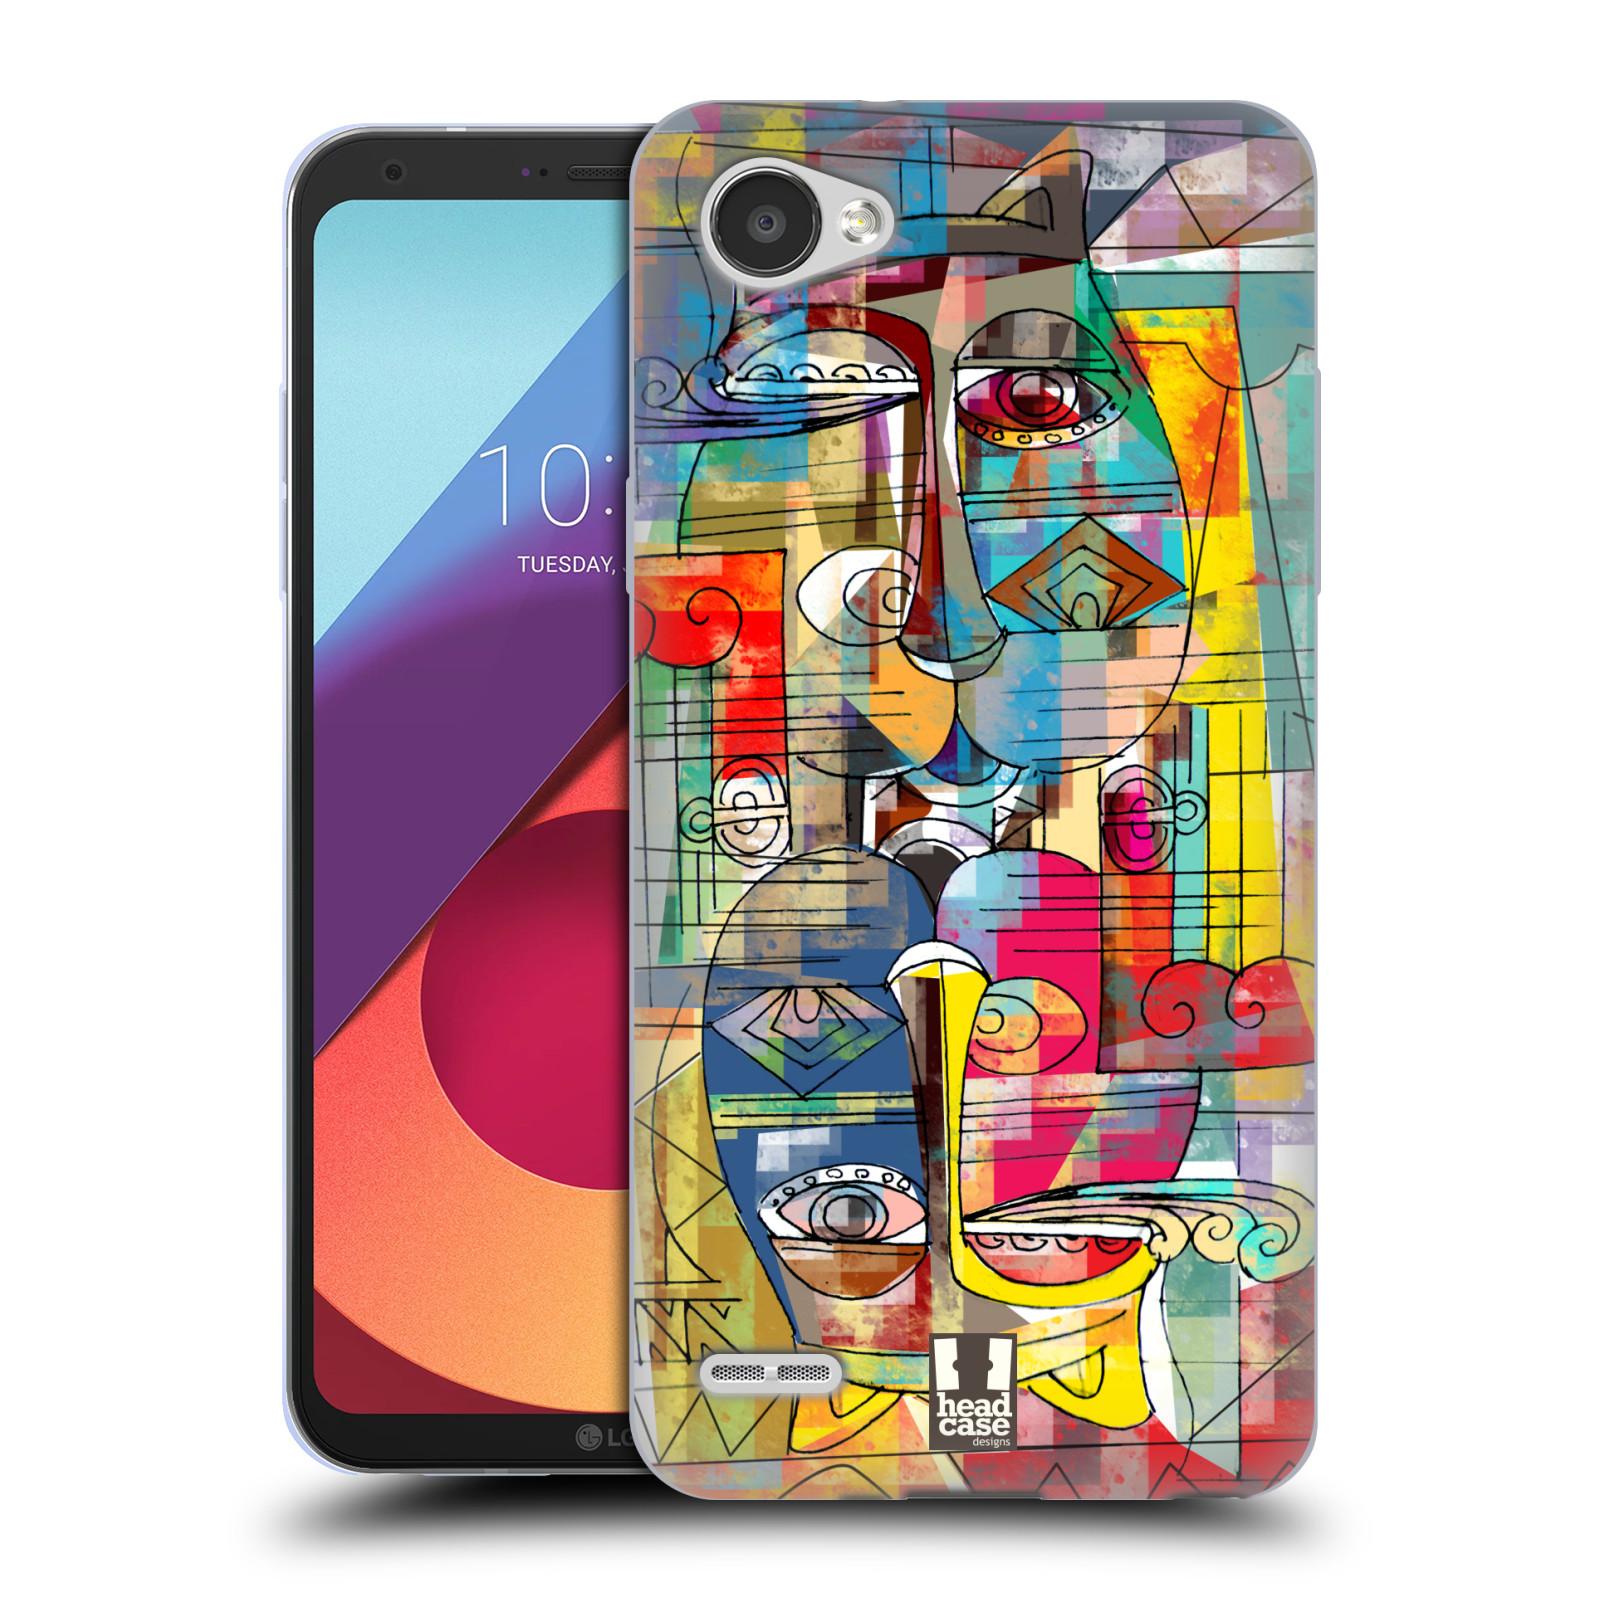 Silikonové pouzdro na mobil LG Q6 - Head Case - AZTEC MANX